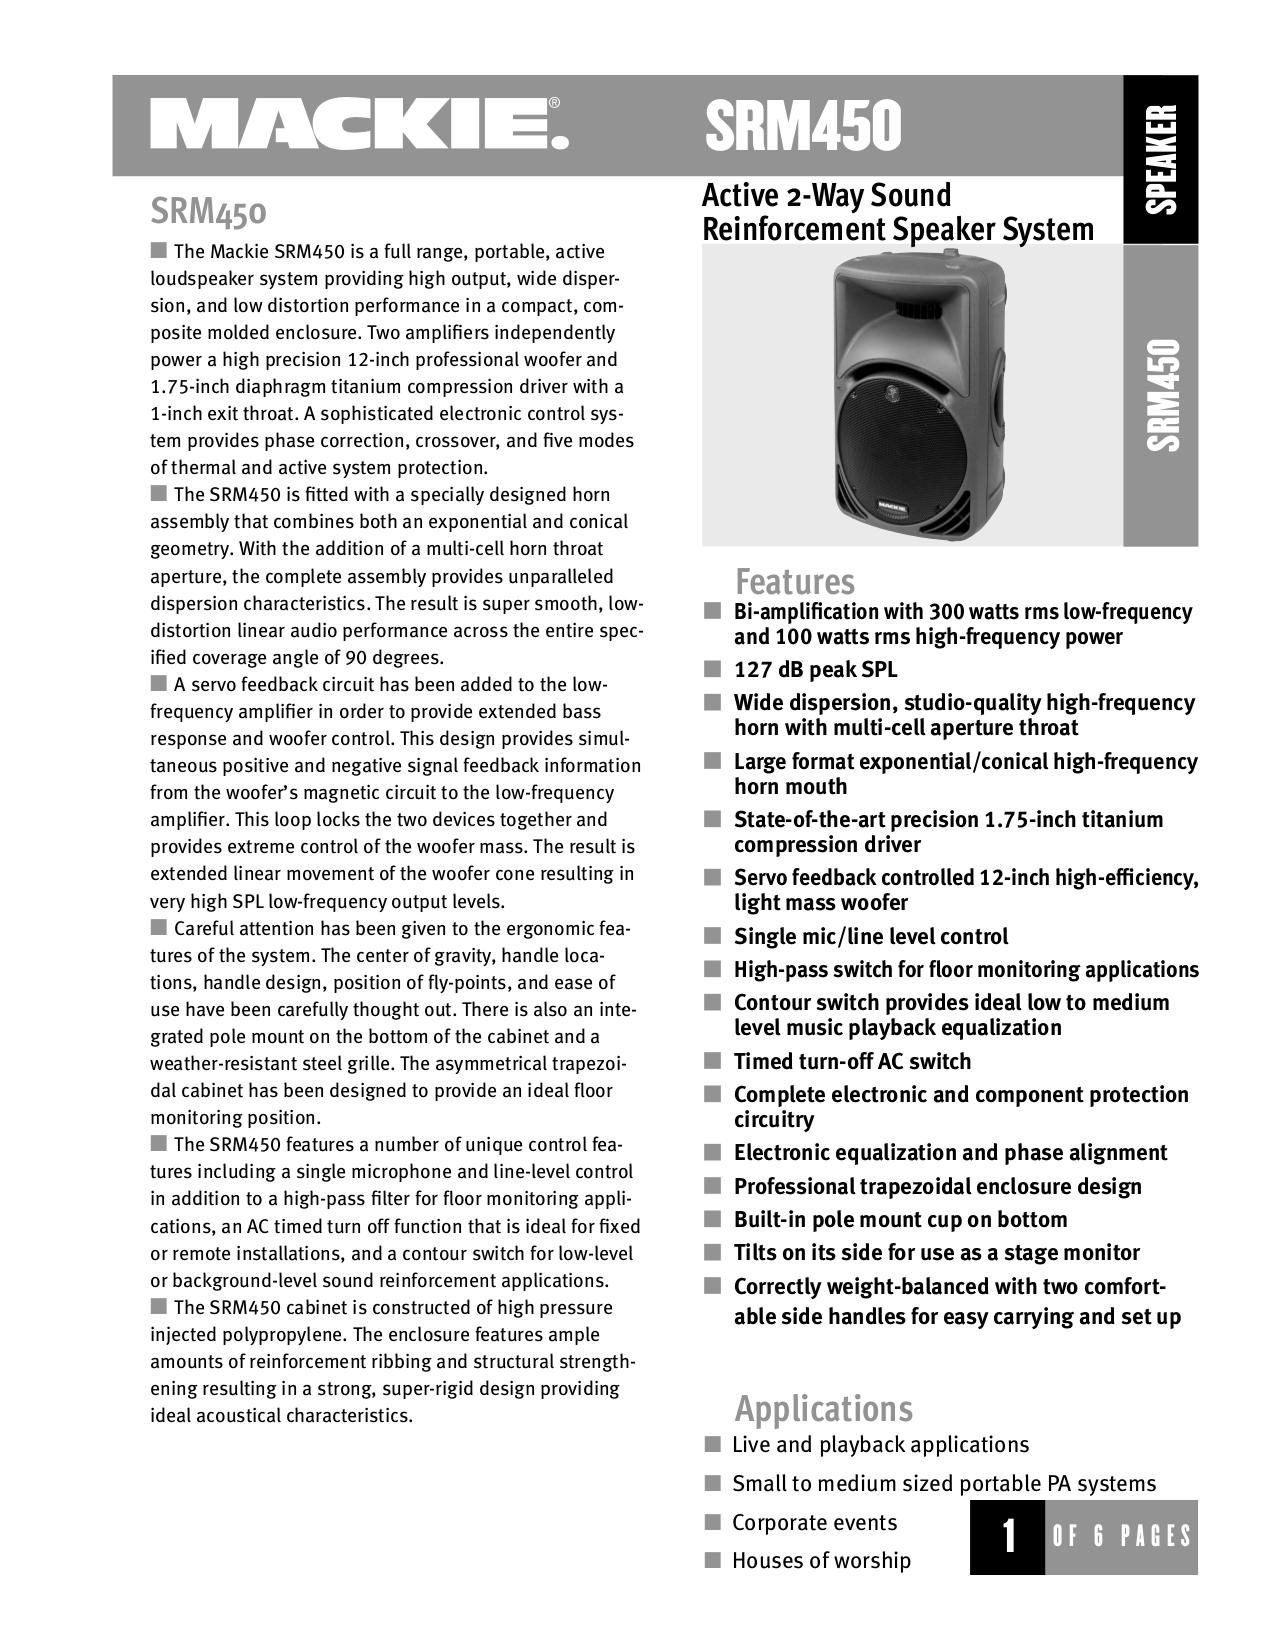 download free pdf for mackie srm450 speaker system manual rh umlib com mackie srm 450 v1 service manual mackie srm450 review